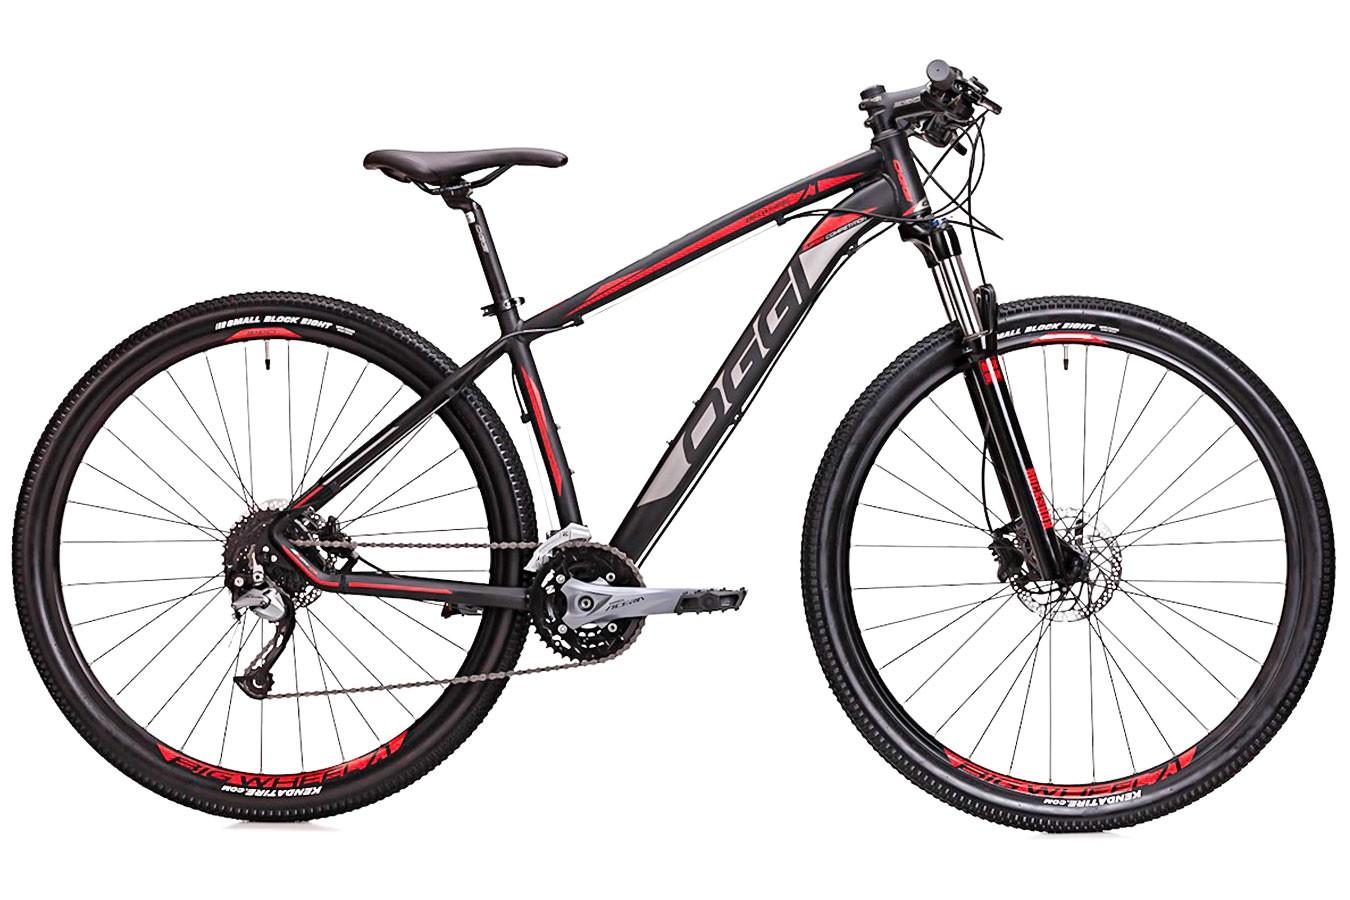 Bicicleta 29 Big Wheel 7 1 Aluminio 27v Acera